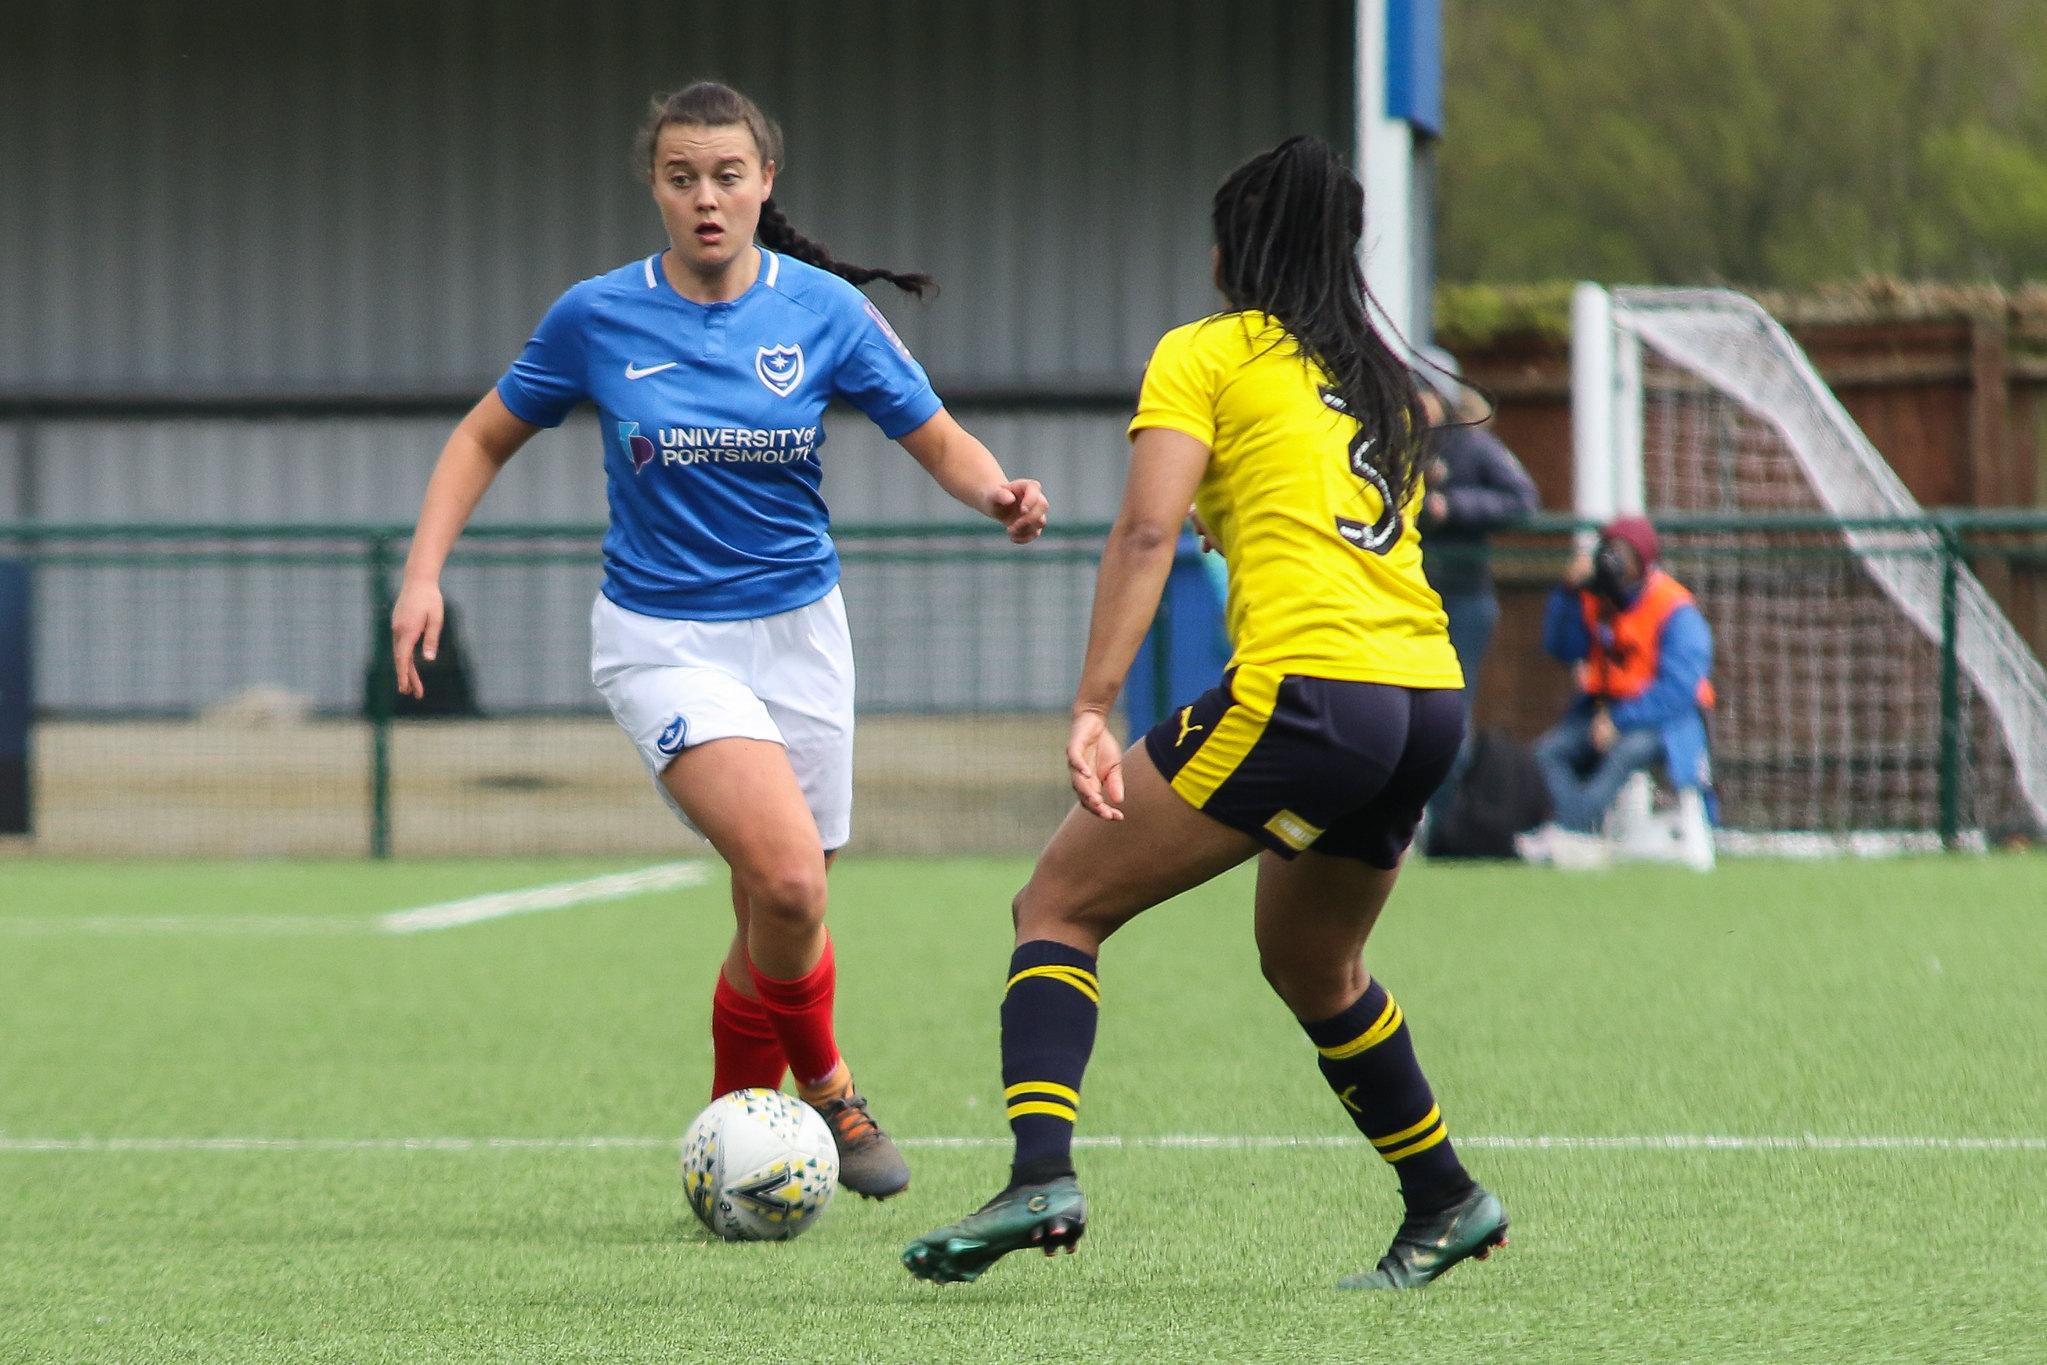 Jade Bradley taking on Oxford United. Photo by Jordan Hampton